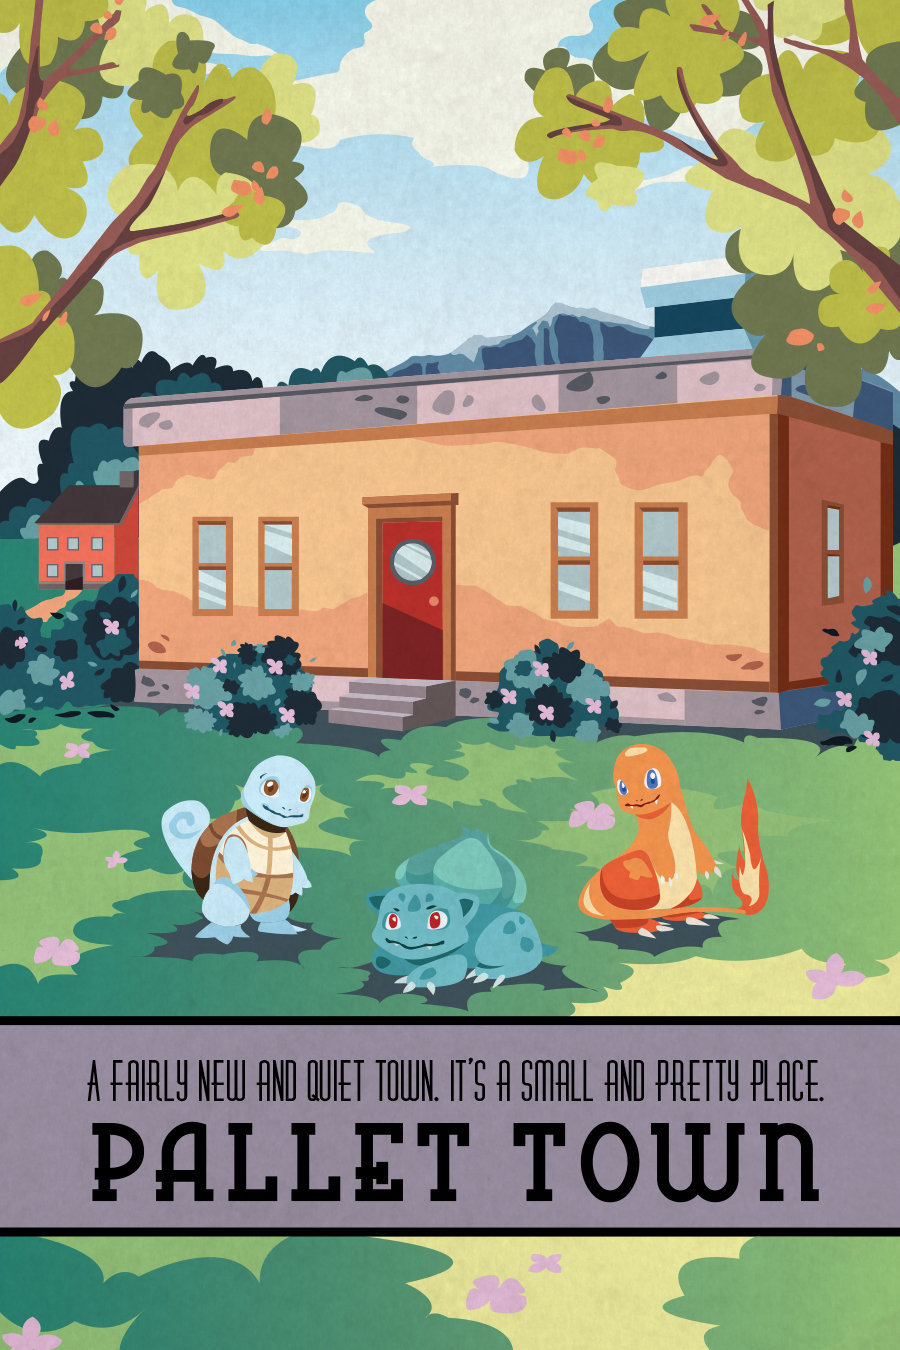 pokemon travel posters created